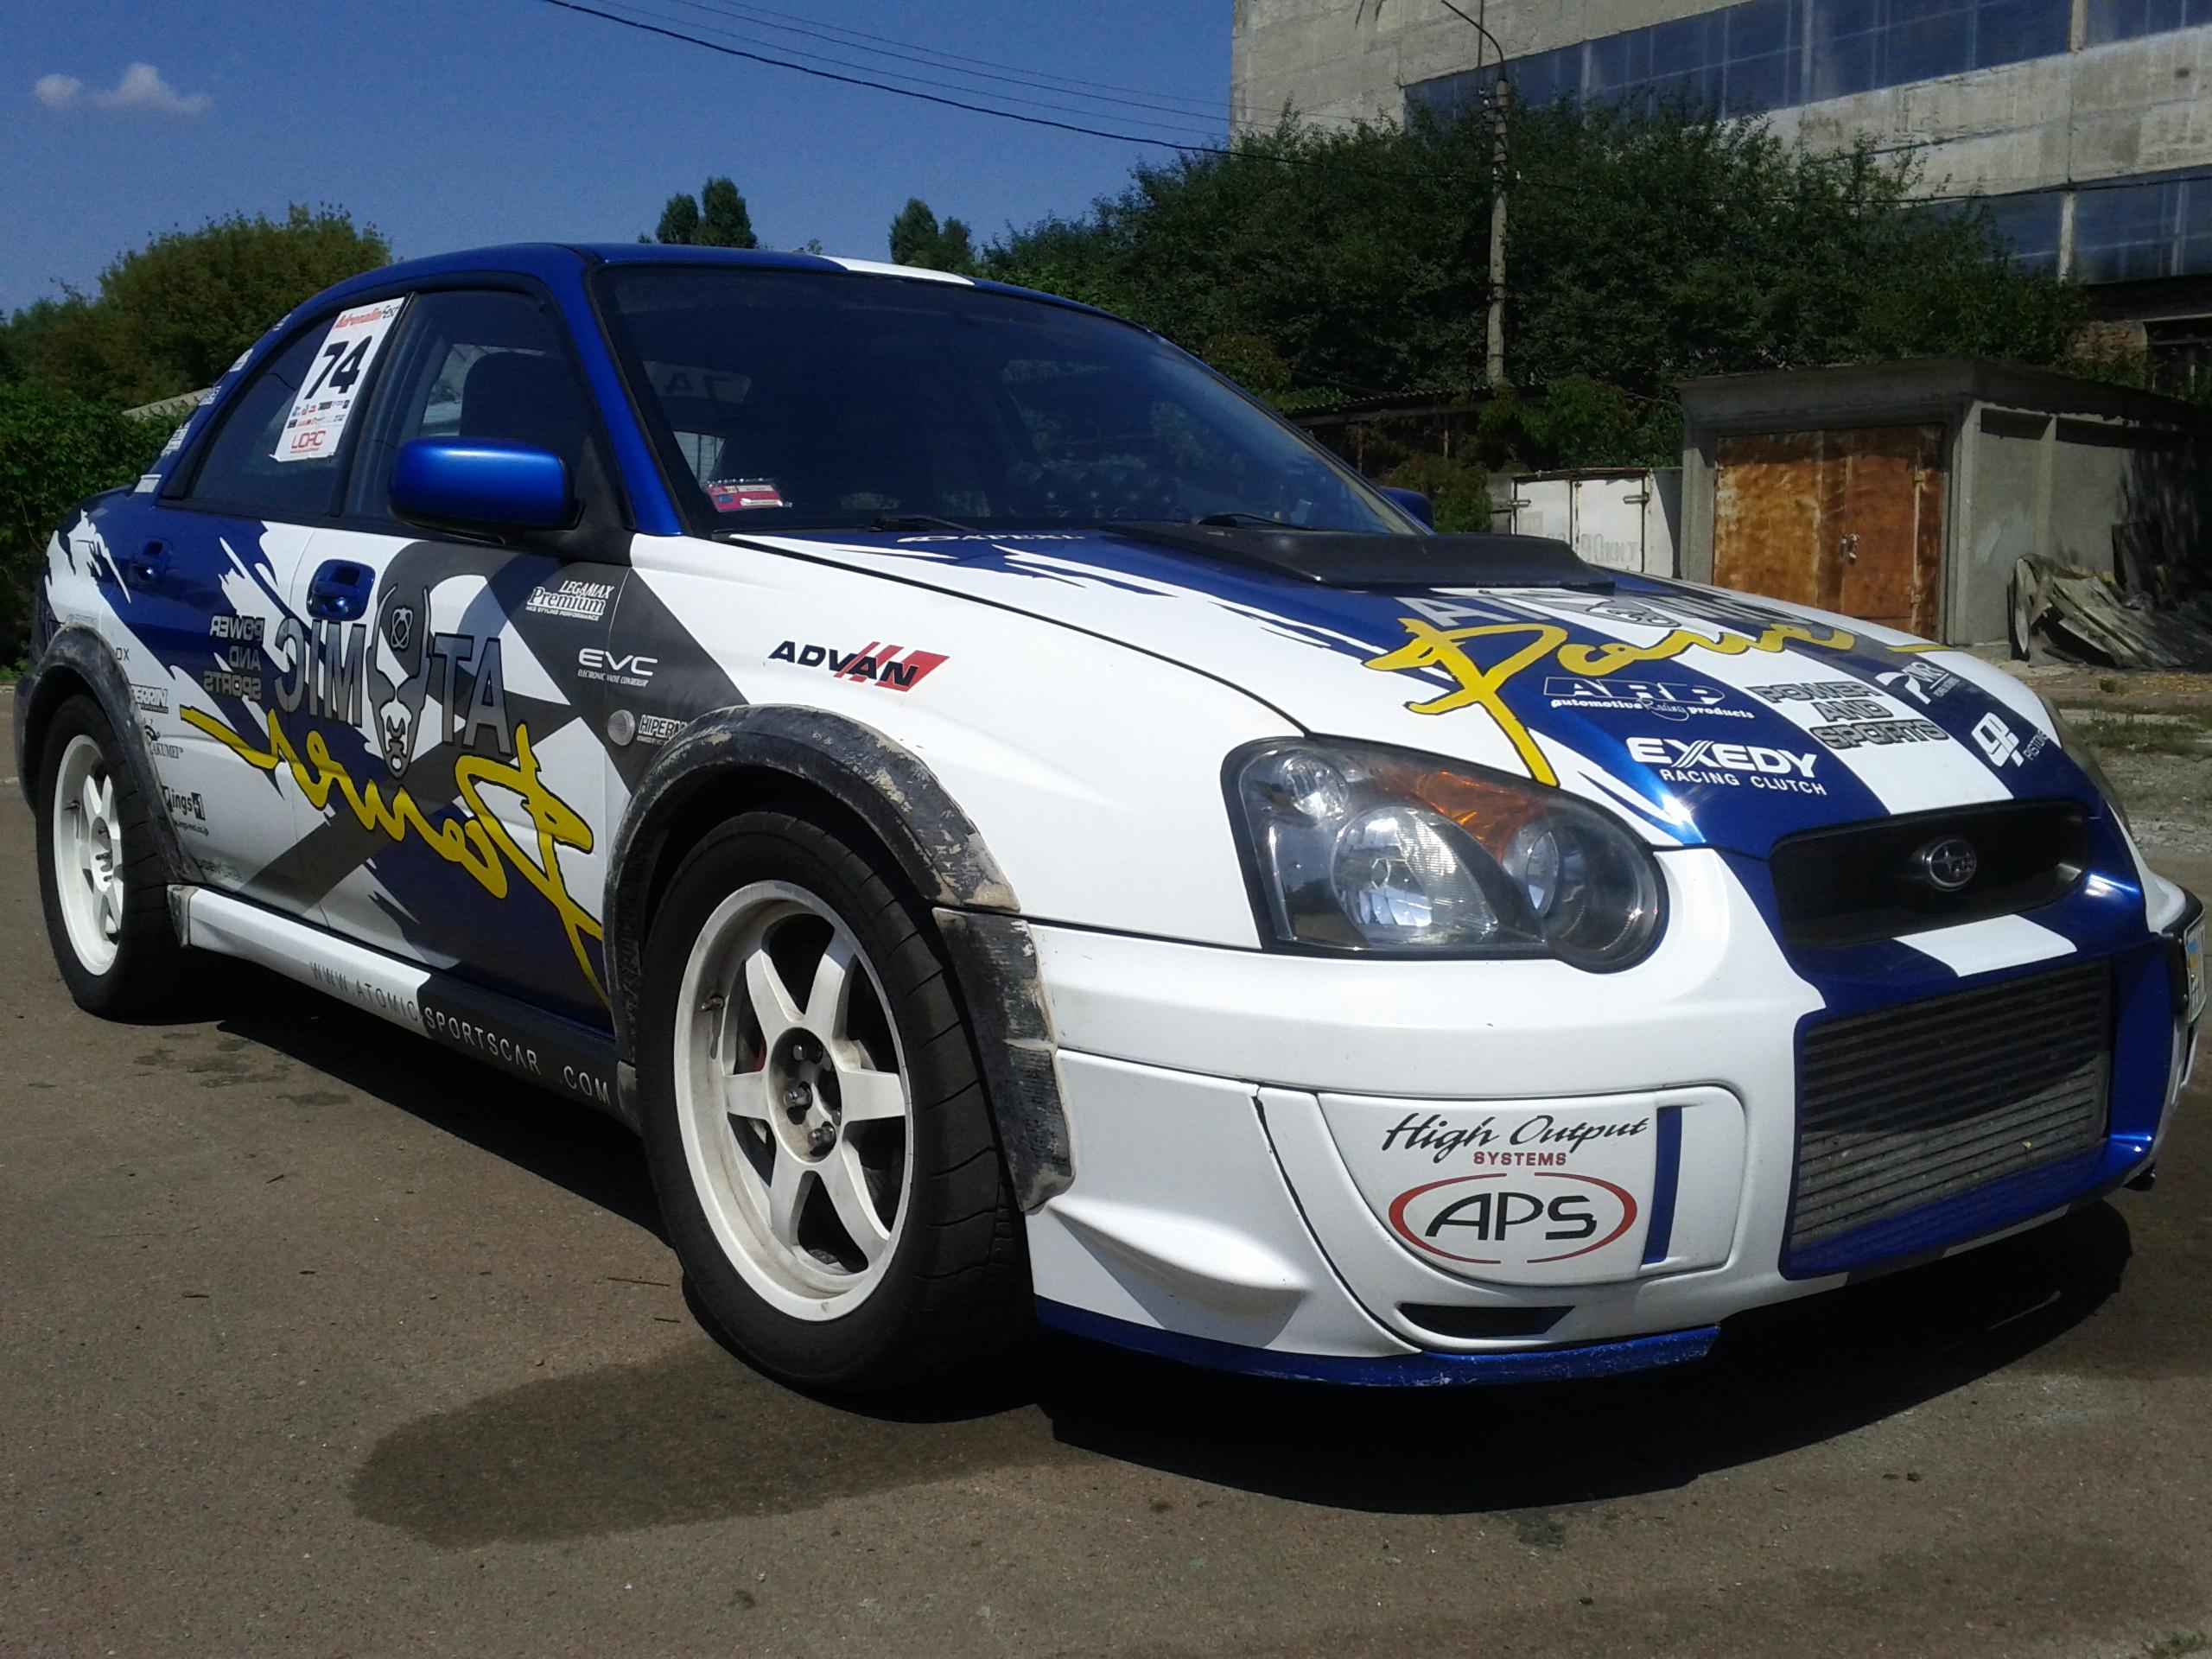 Subaru Wrx 0 60 Times 0 60 Specs